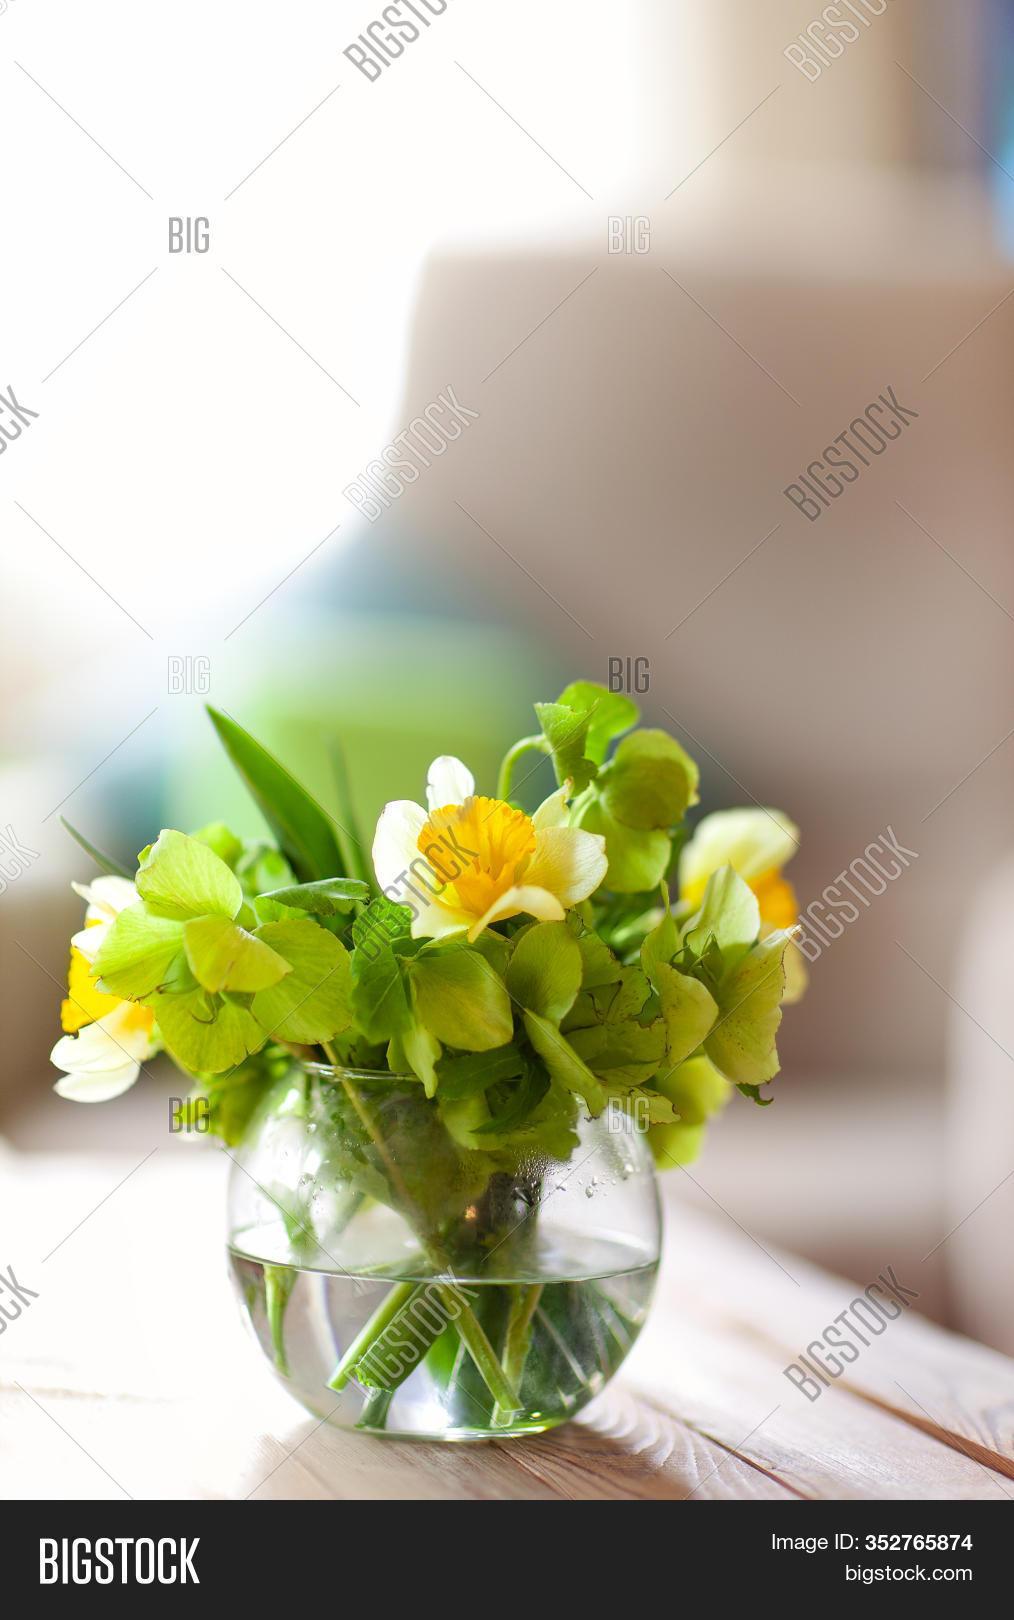 Round Vase Clean Water Image Photo Free Trial Bigstock